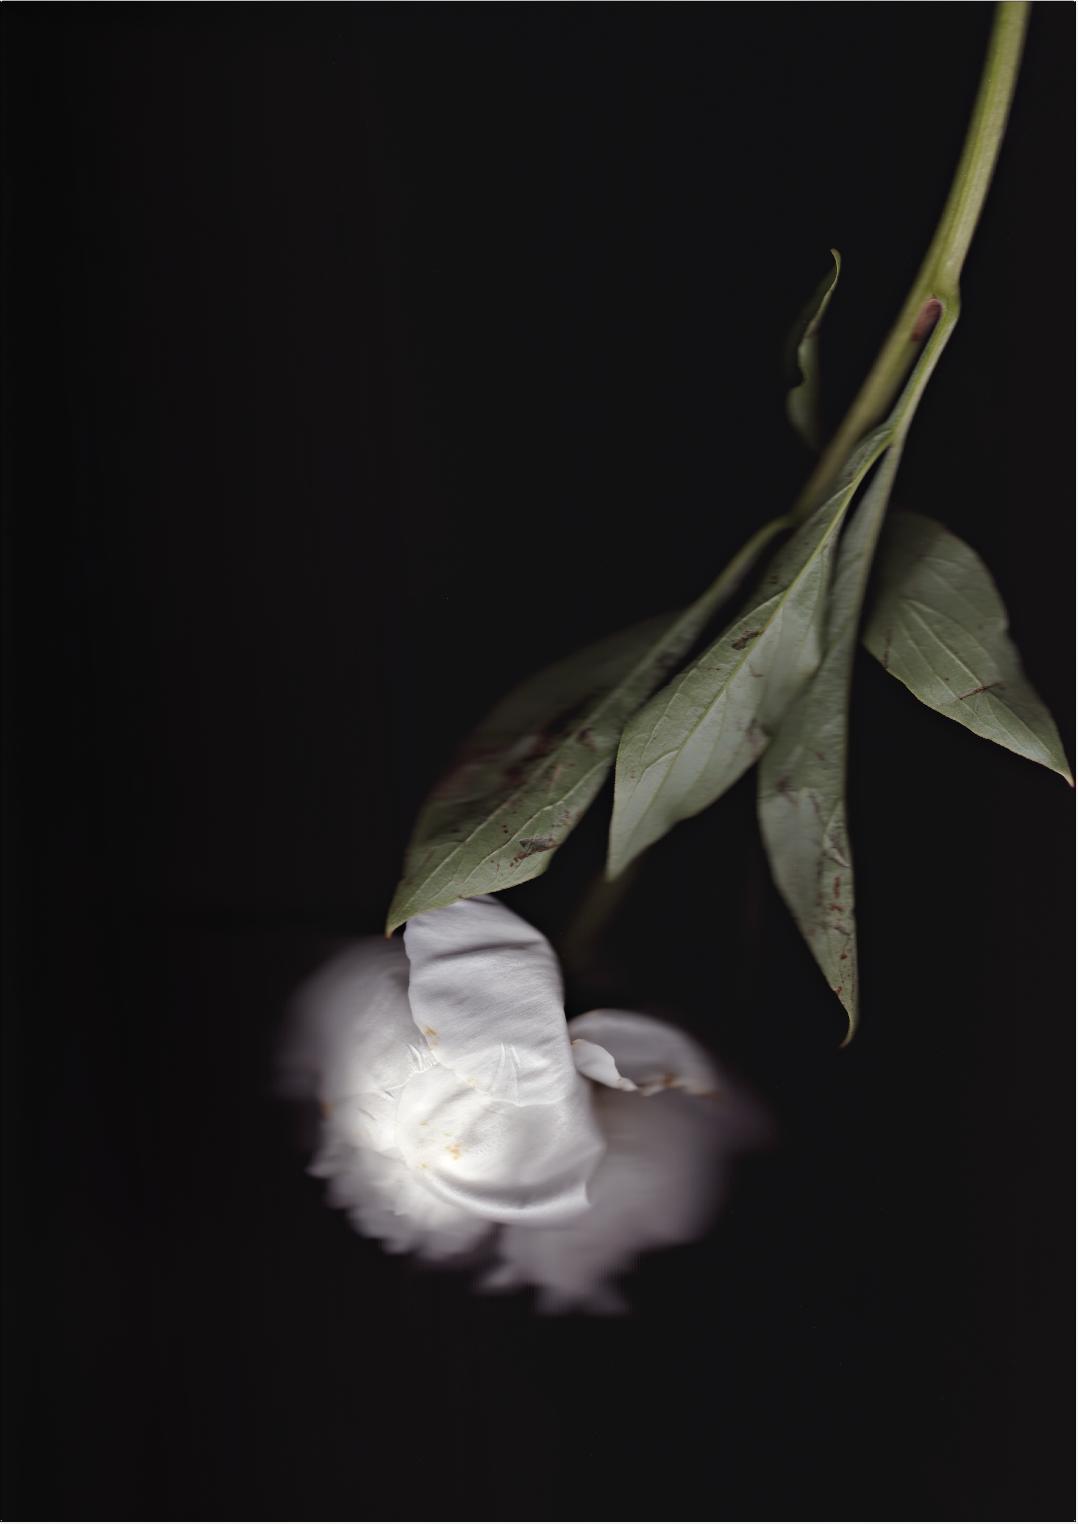 XX. NIGHT OF THE FLOWERS